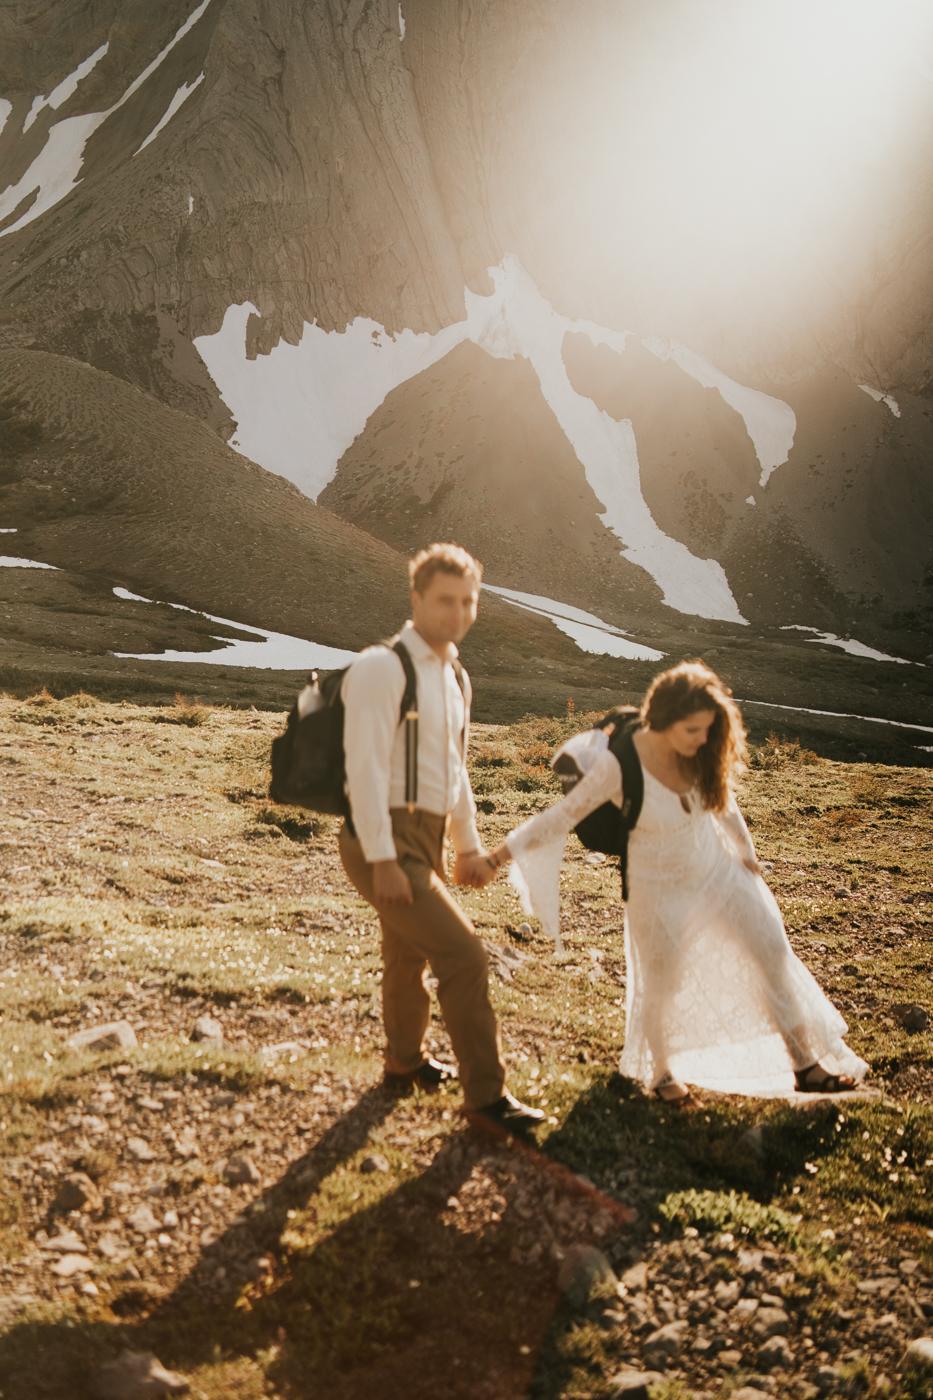 tyraephotography_photographer_wedding_elopement_engagement_photography-08452.jpg